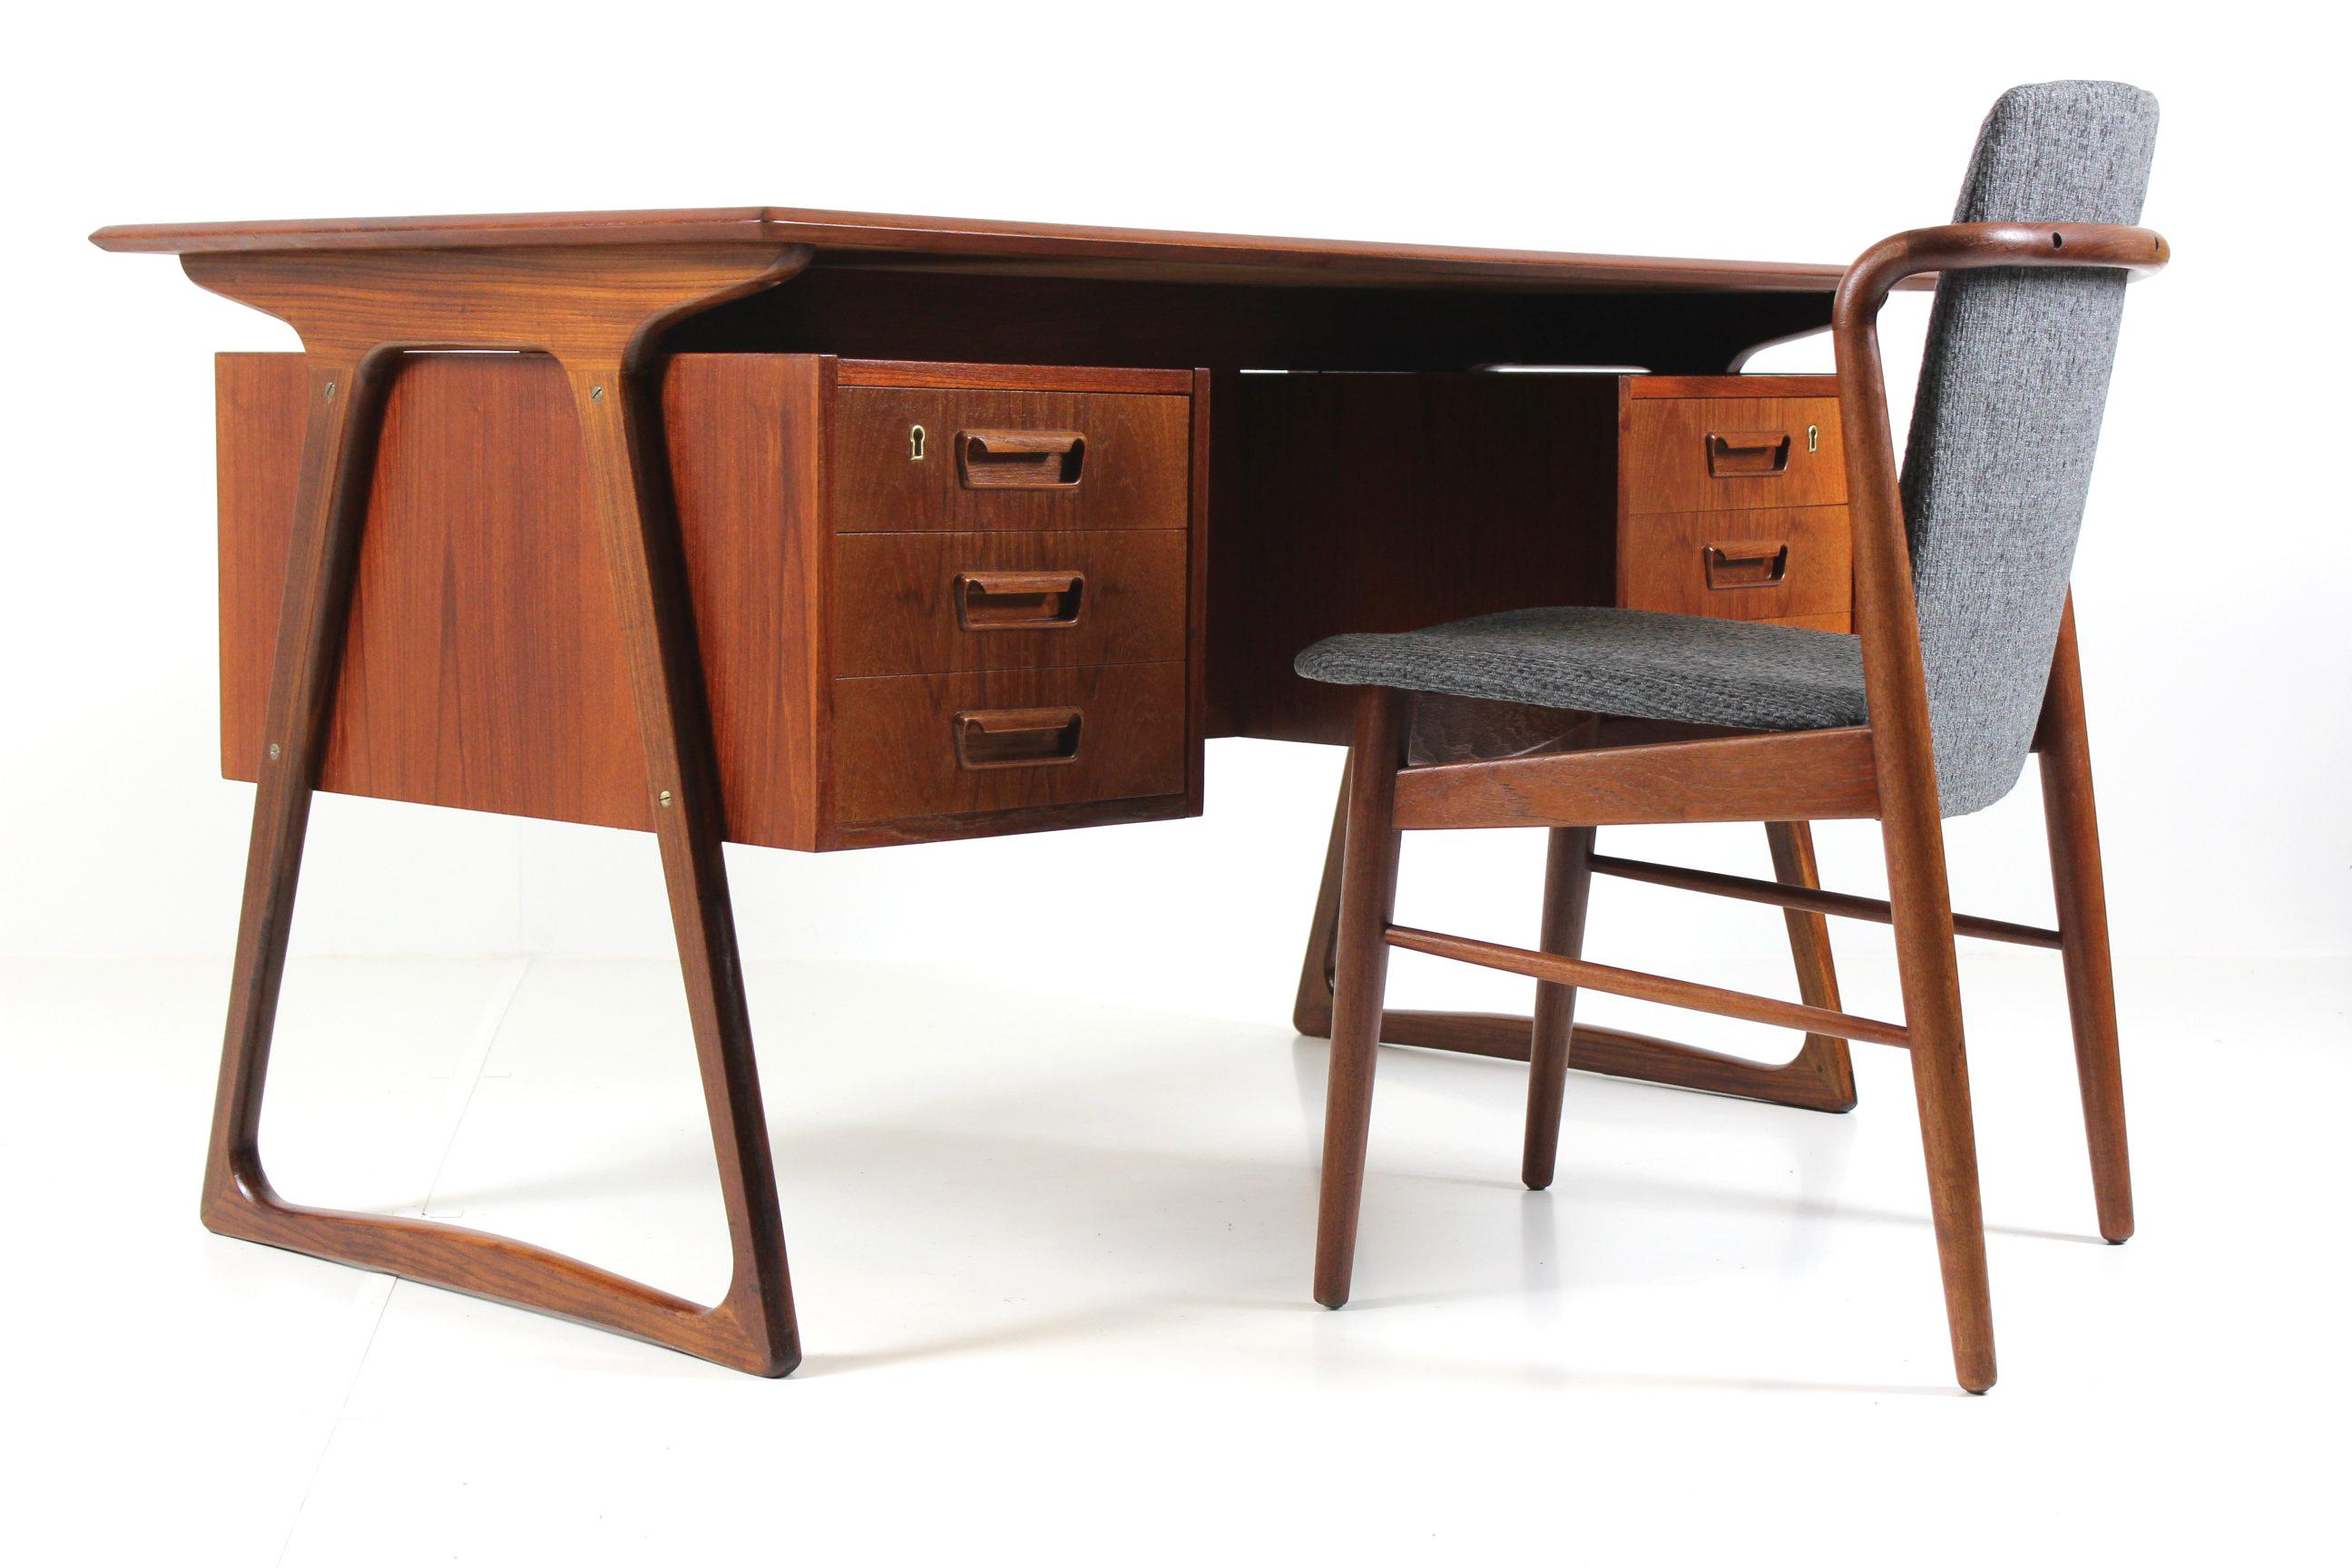 Image of: Retro Vintage Classic Mid Century Desk In Teak From Sibast Mobler Davint Design